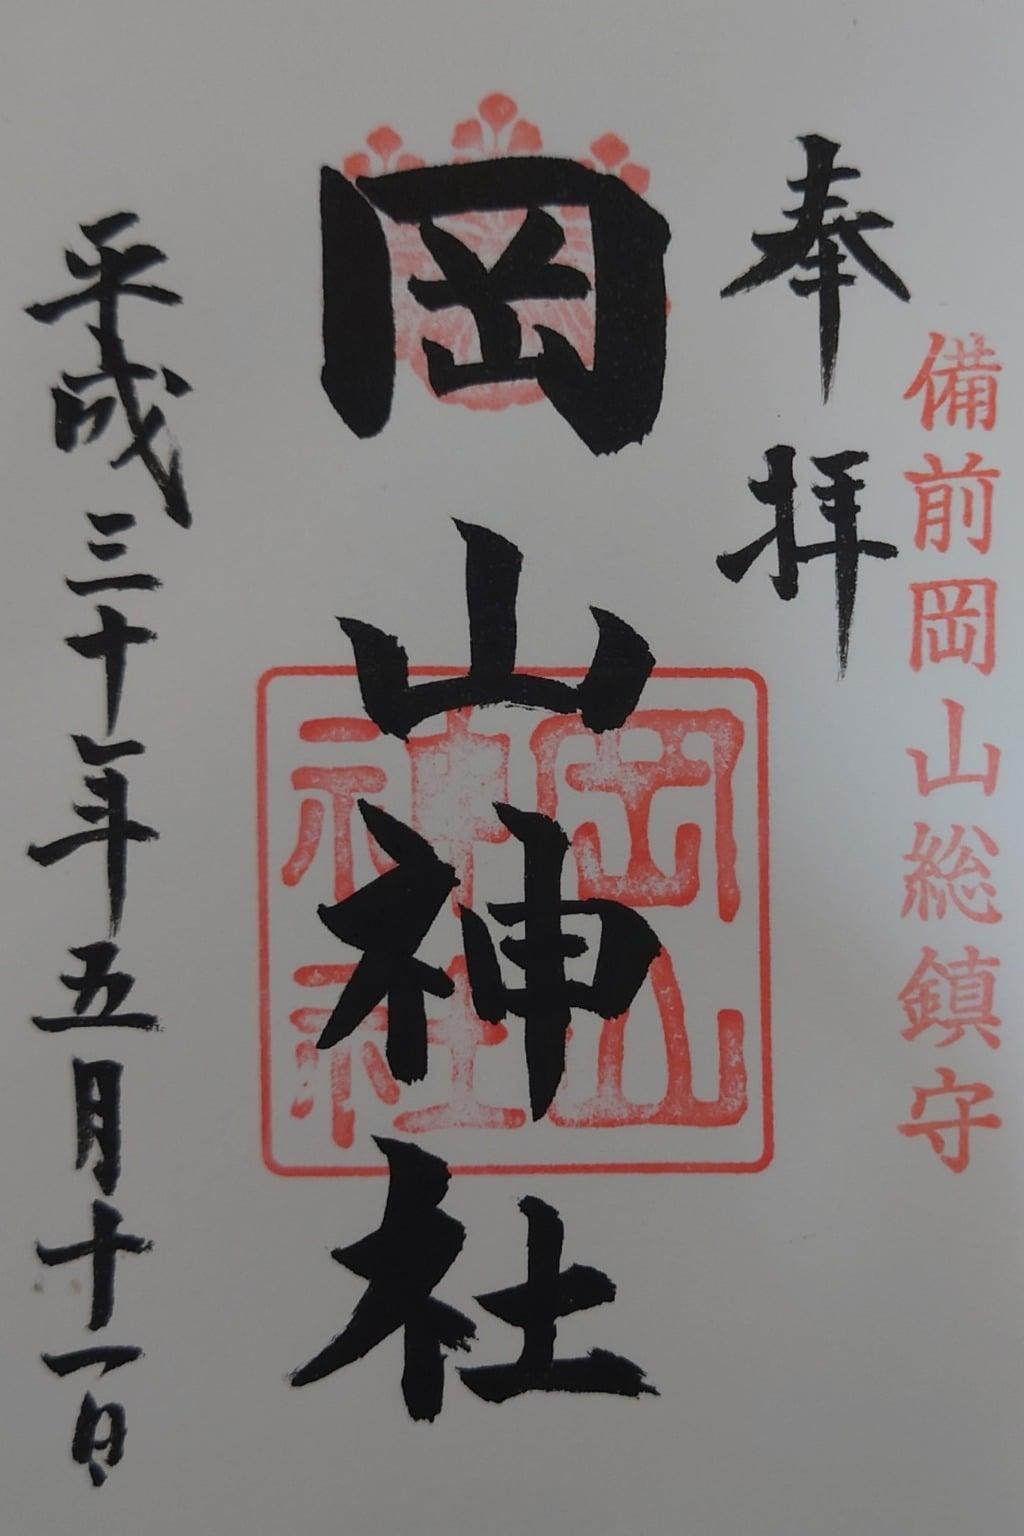 岡山神社の御朱印